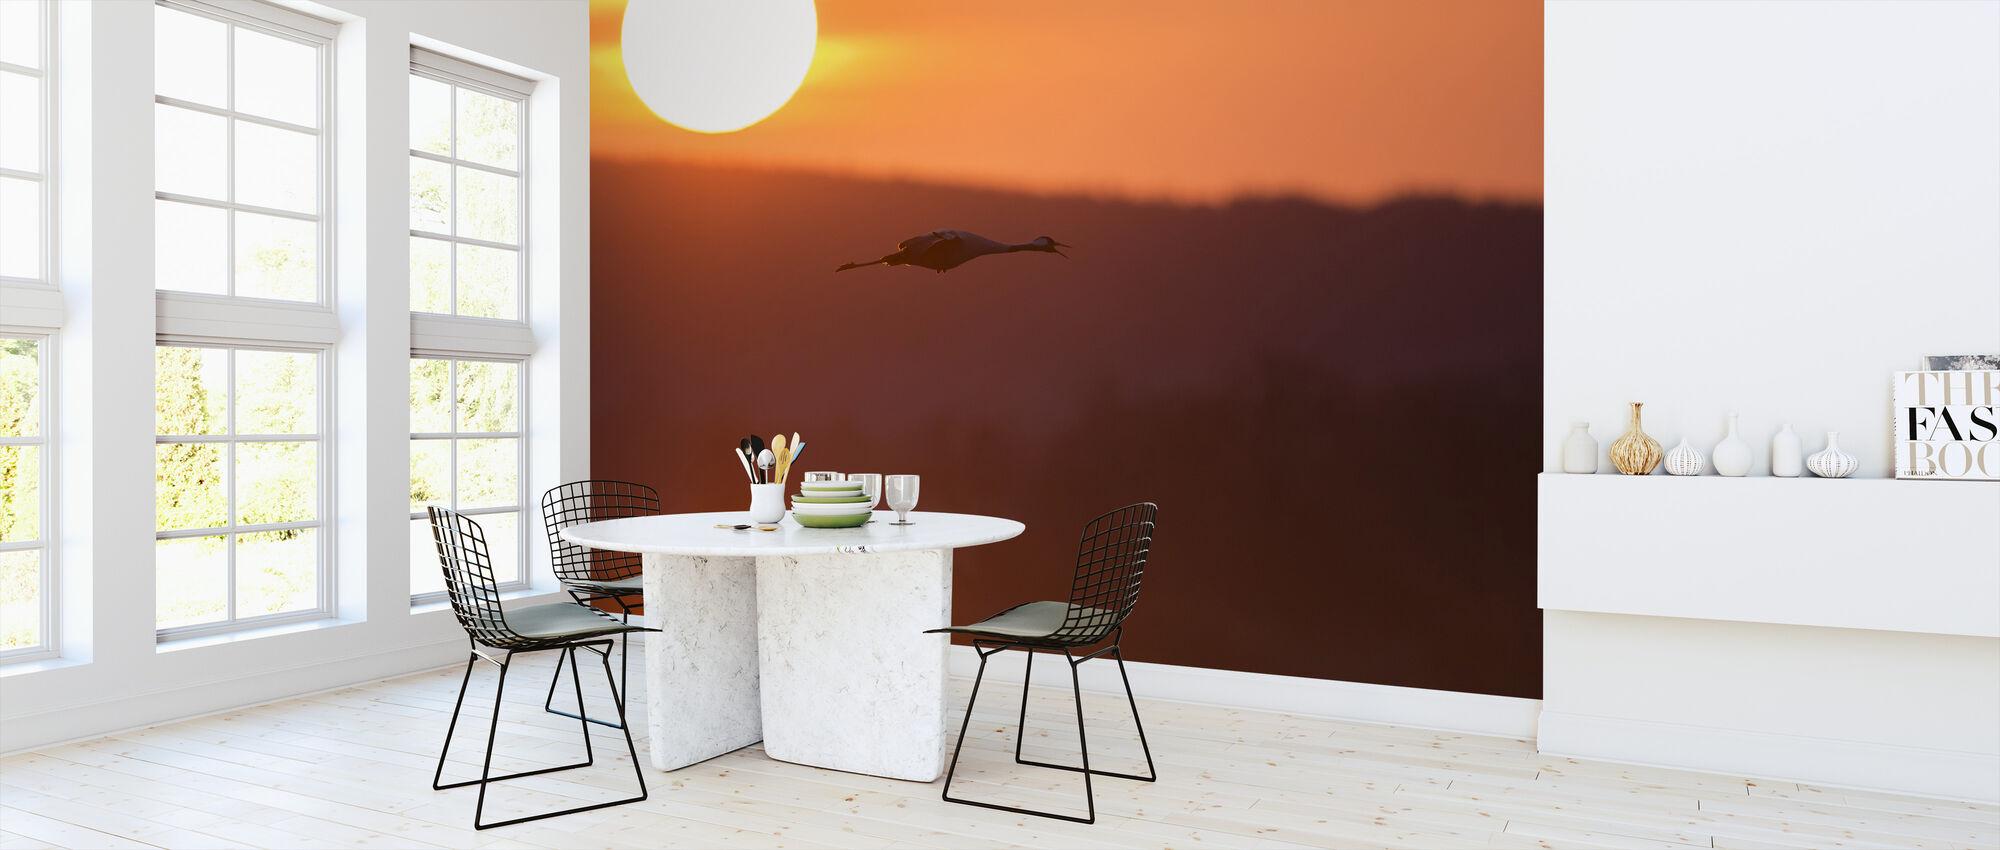 Sunrise at Horborga Lake - Sweden - Wallpaper - Kitchen